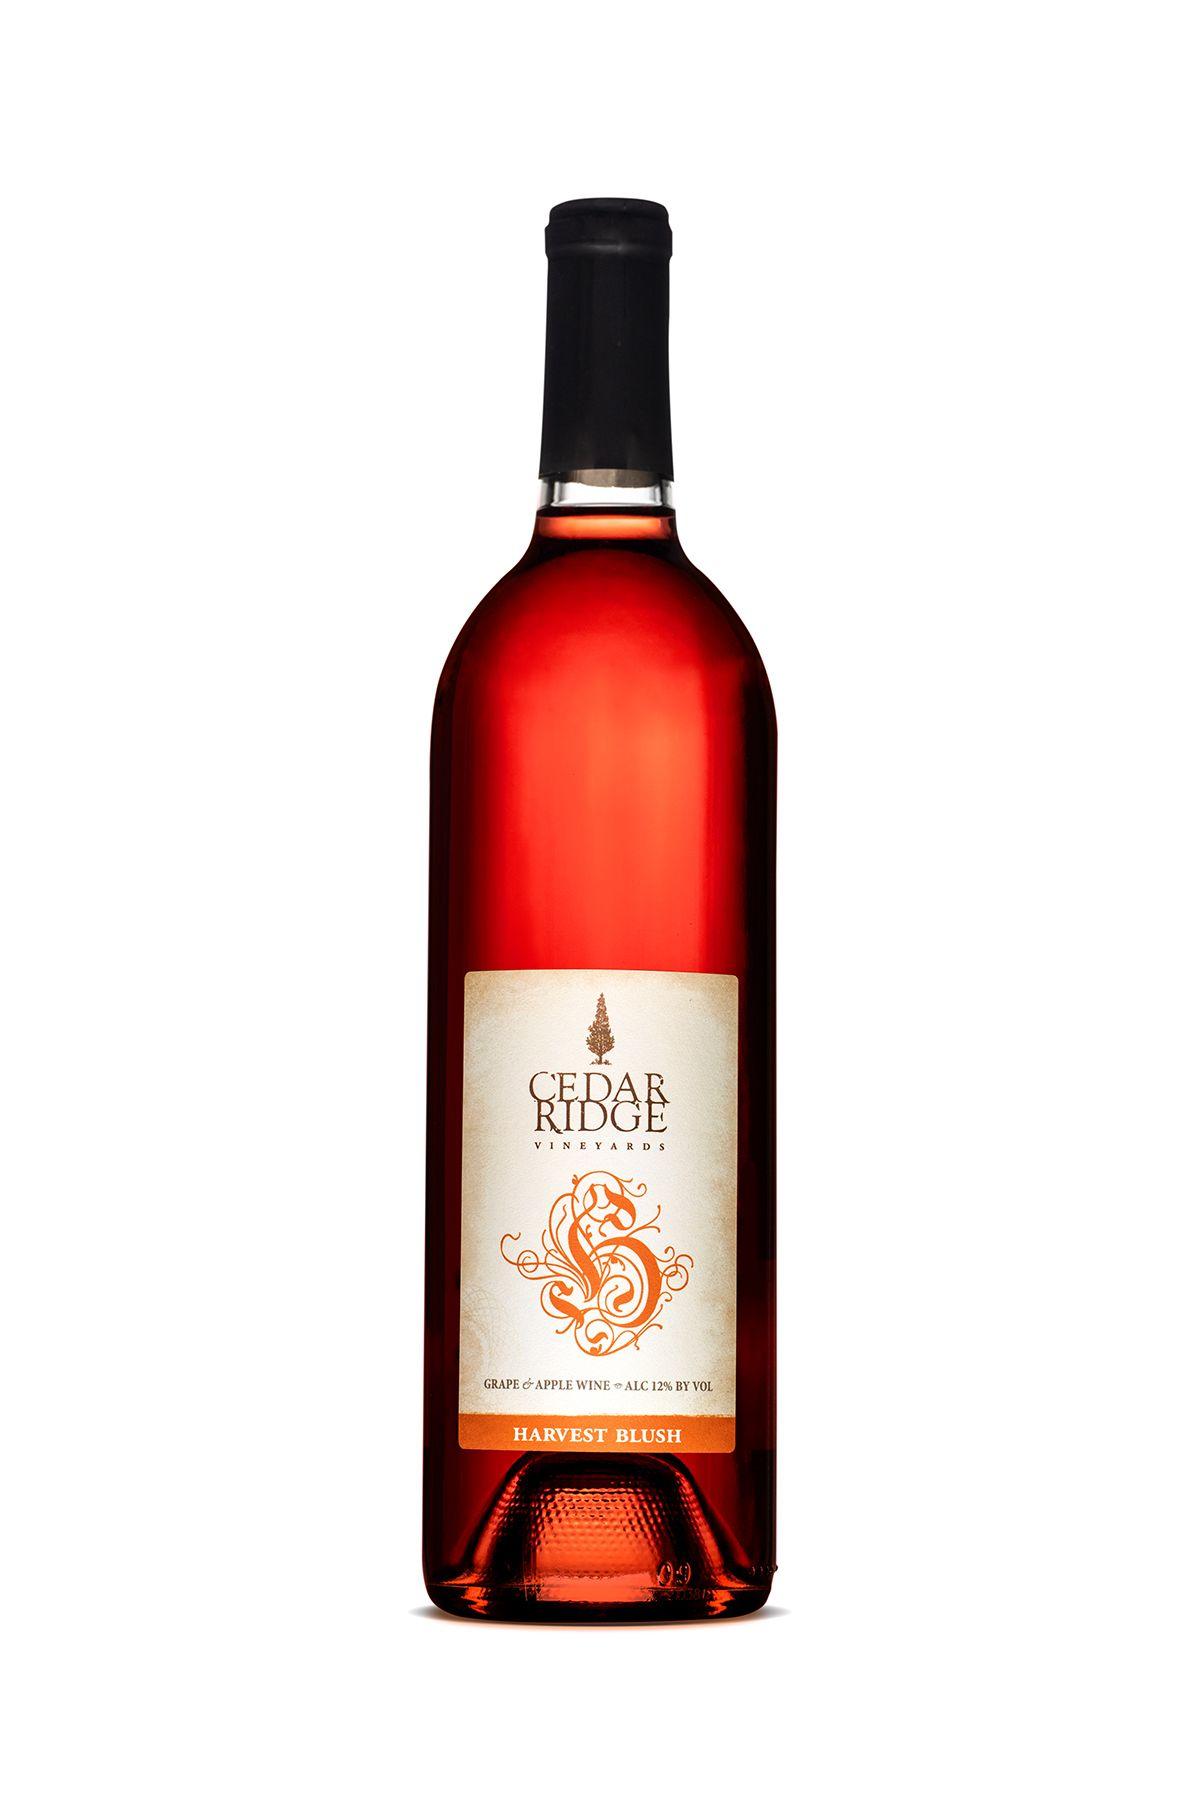 Cedar Ridge Vineyards Winery And Distillery Wine Bottle And Label Package Design In 2020 Wine Bottle Wine Bottle Labels Distillery